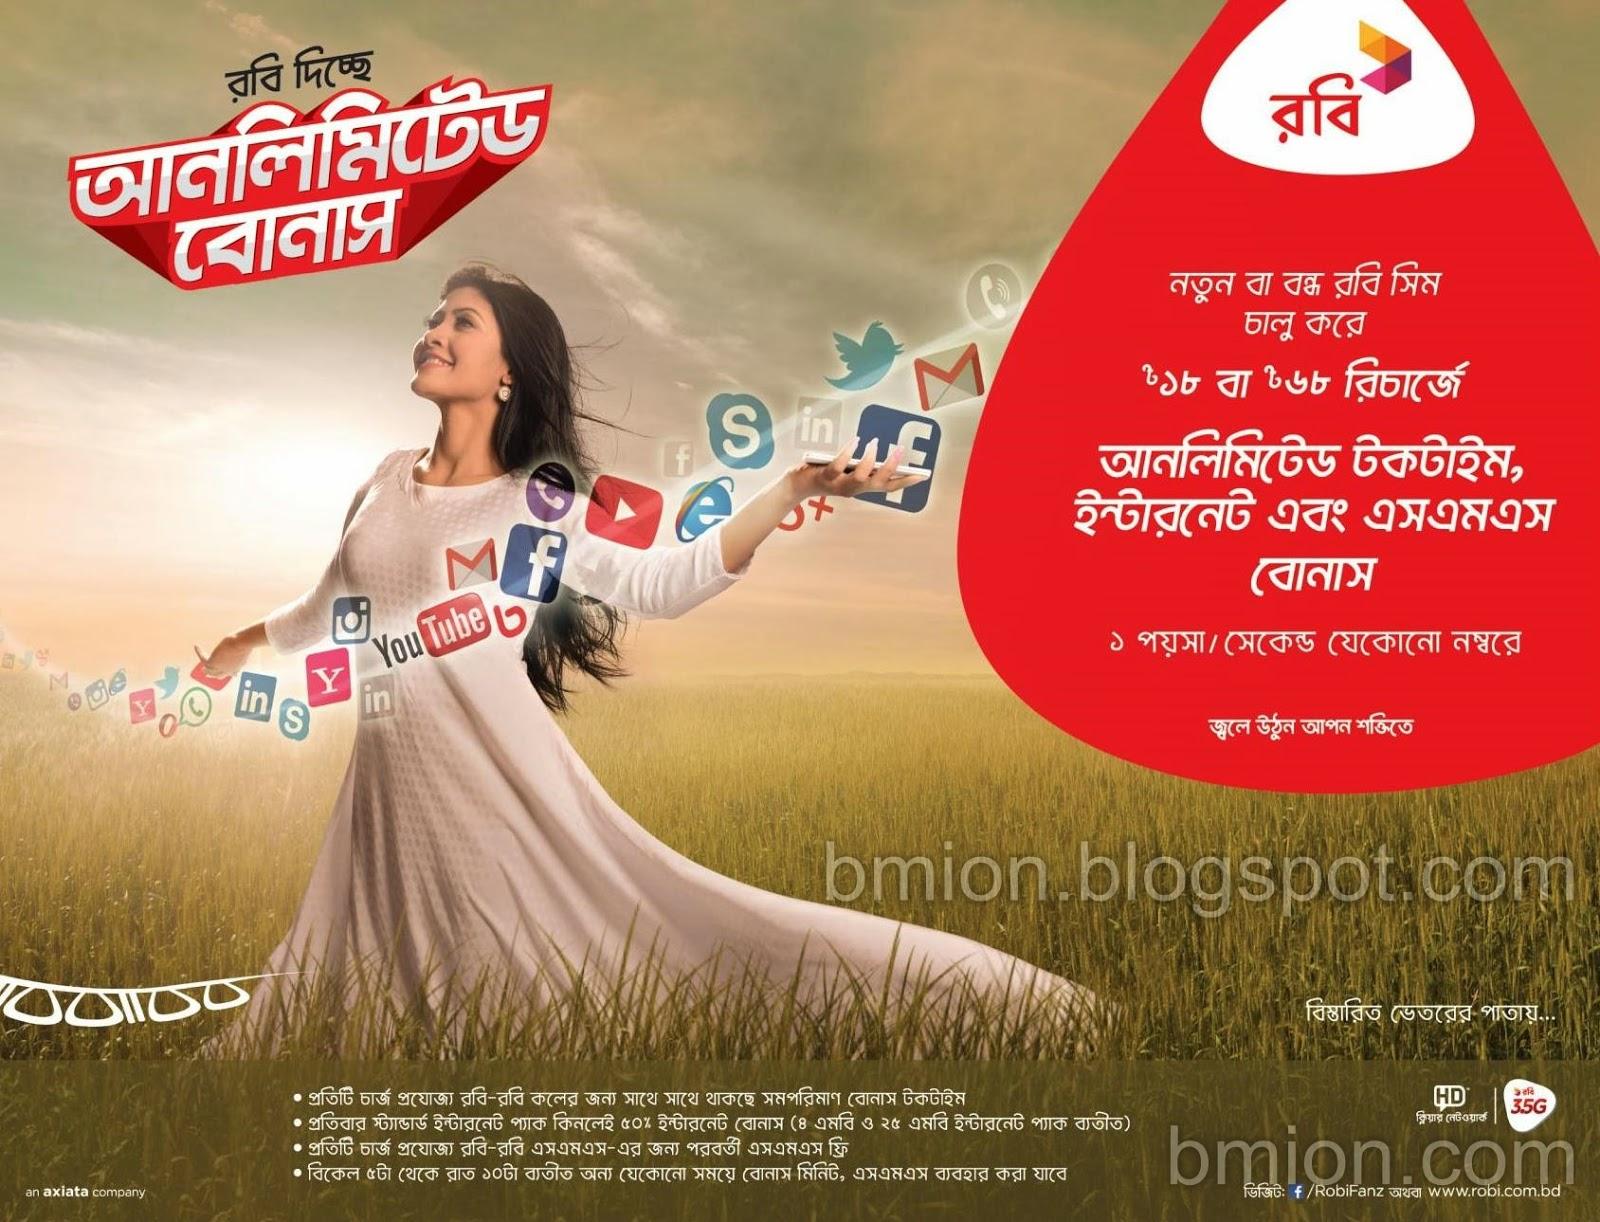 Robi-Reactivation-Bondho-SIM-offer-Unlimited-Talktime-Internet-SMS-Bonus-1pSec-to-Any-Number-Recharge-18Tk-or-68Tk-prepaid-and-postpaid